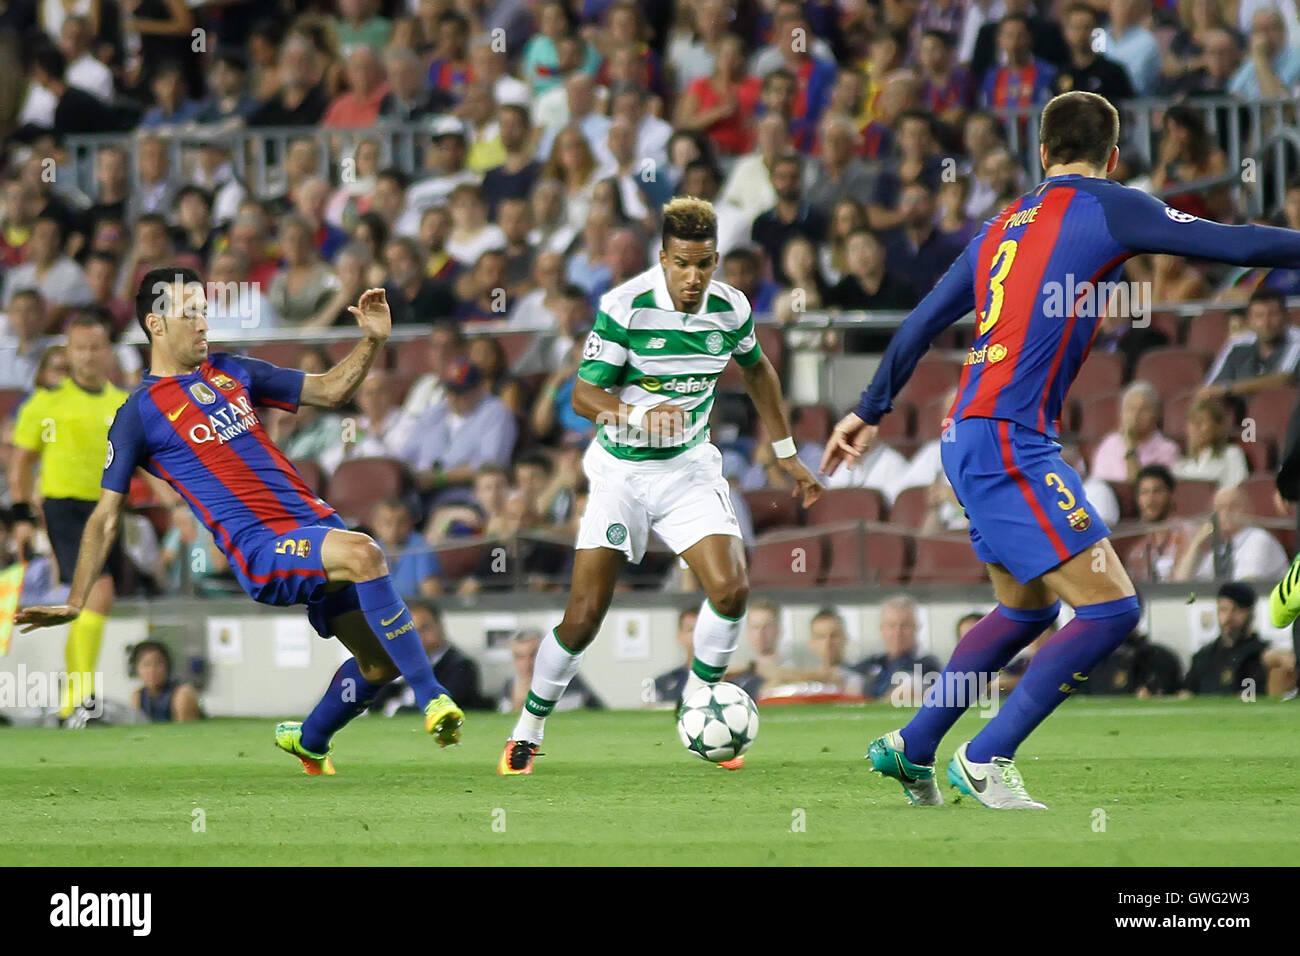 Nou Camp, Barcelona, Spain. 13th Sep, 2016. UEFA Champions League Football. Barcelona versus Celtic. Dembele challenged - Stock Image